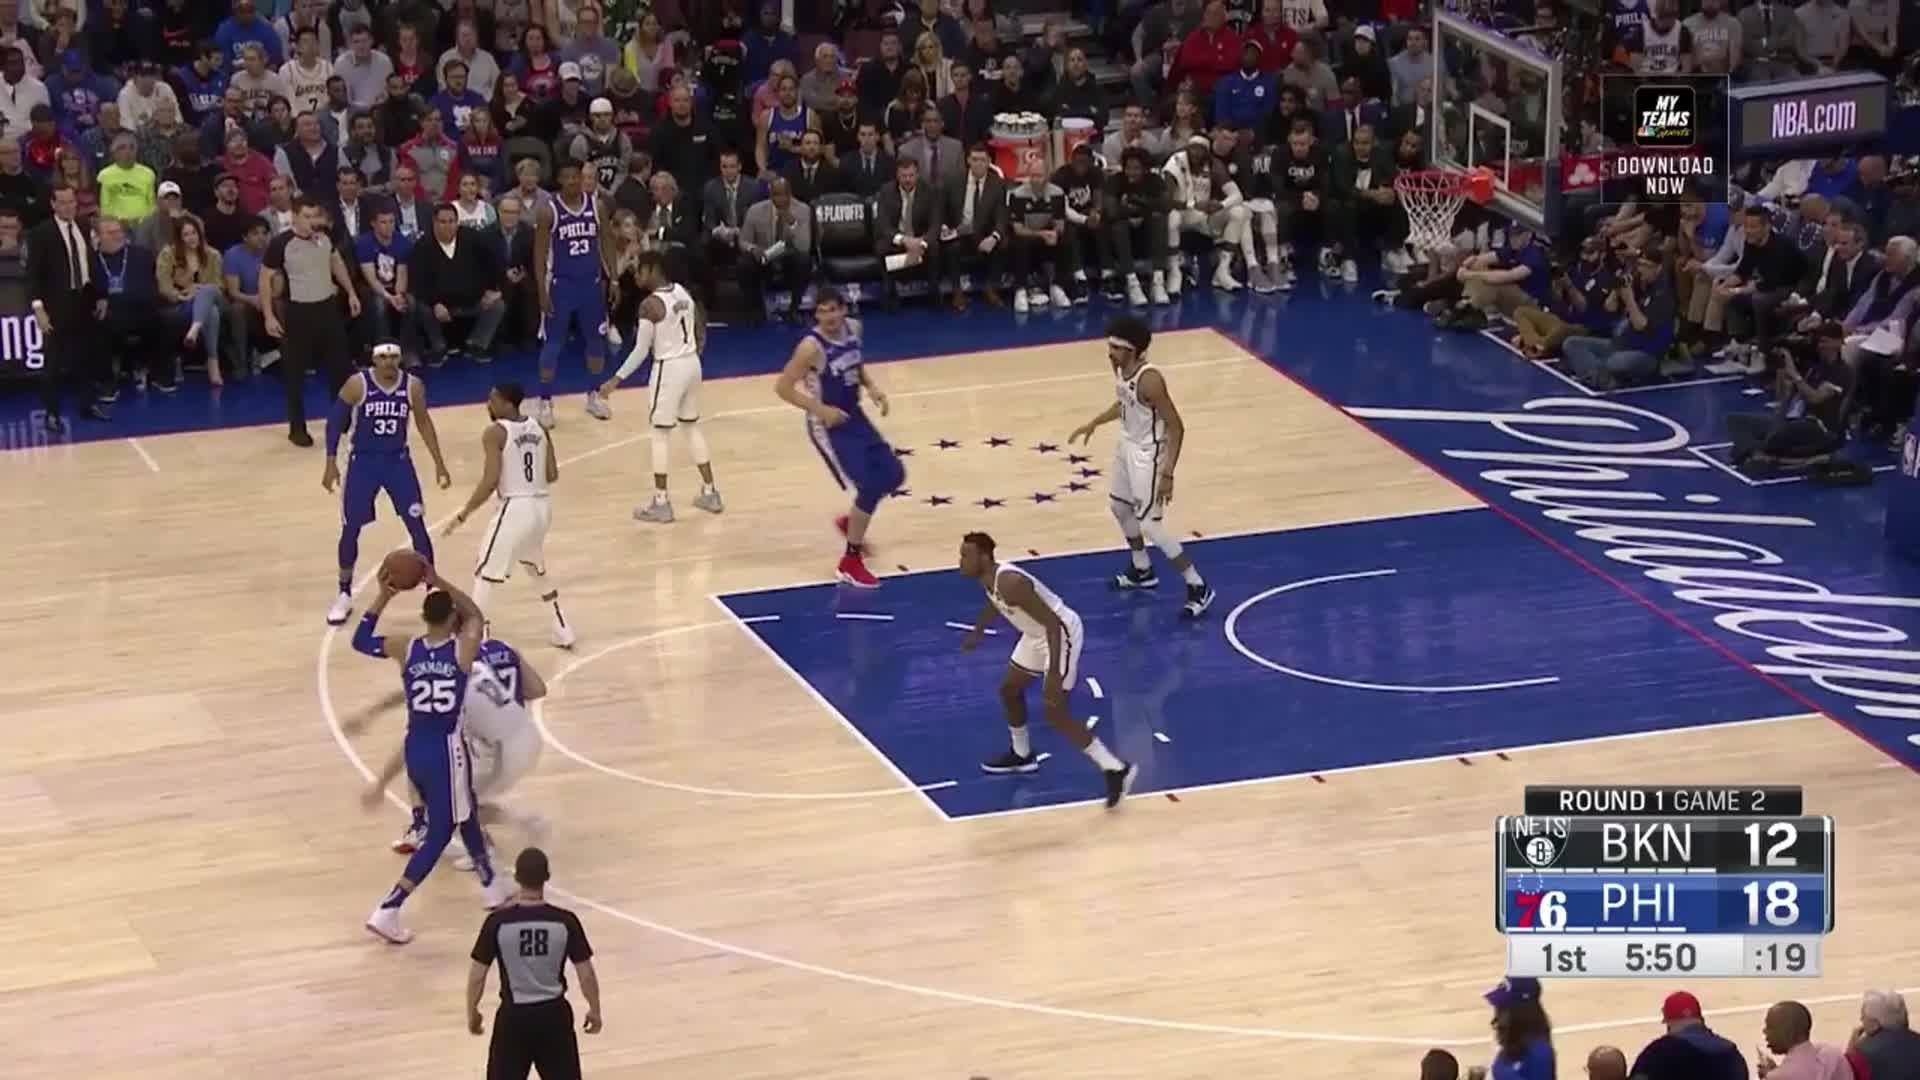 Ben Simmons, Brooklyn Nets, NBA, Philadelphia 76ers, basketball, Simmons Redick two man game_Brooklyn Game 2 GIFs